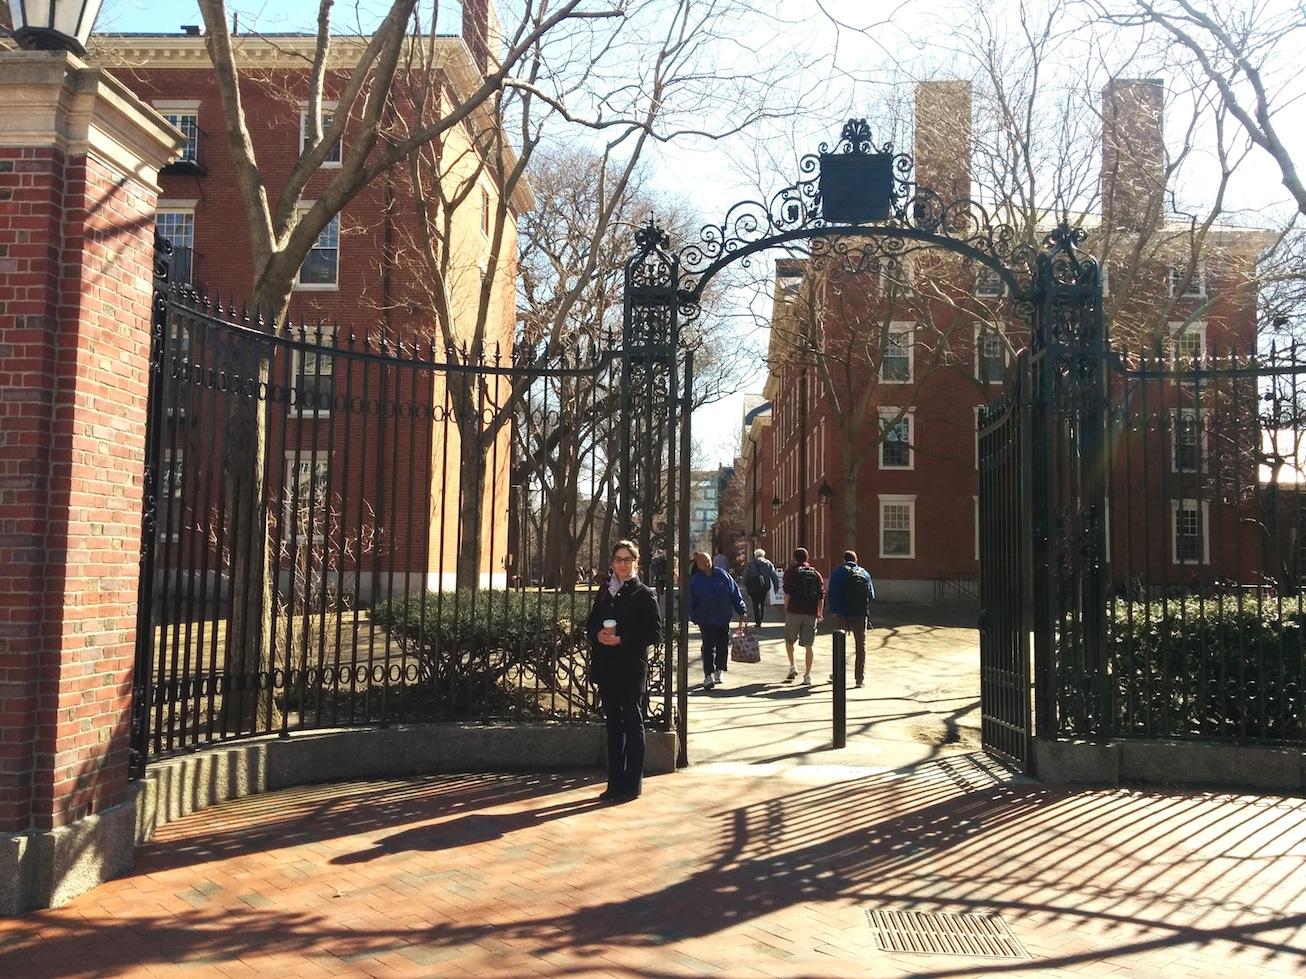 Entrance to Harvard Yard, Spring 204.